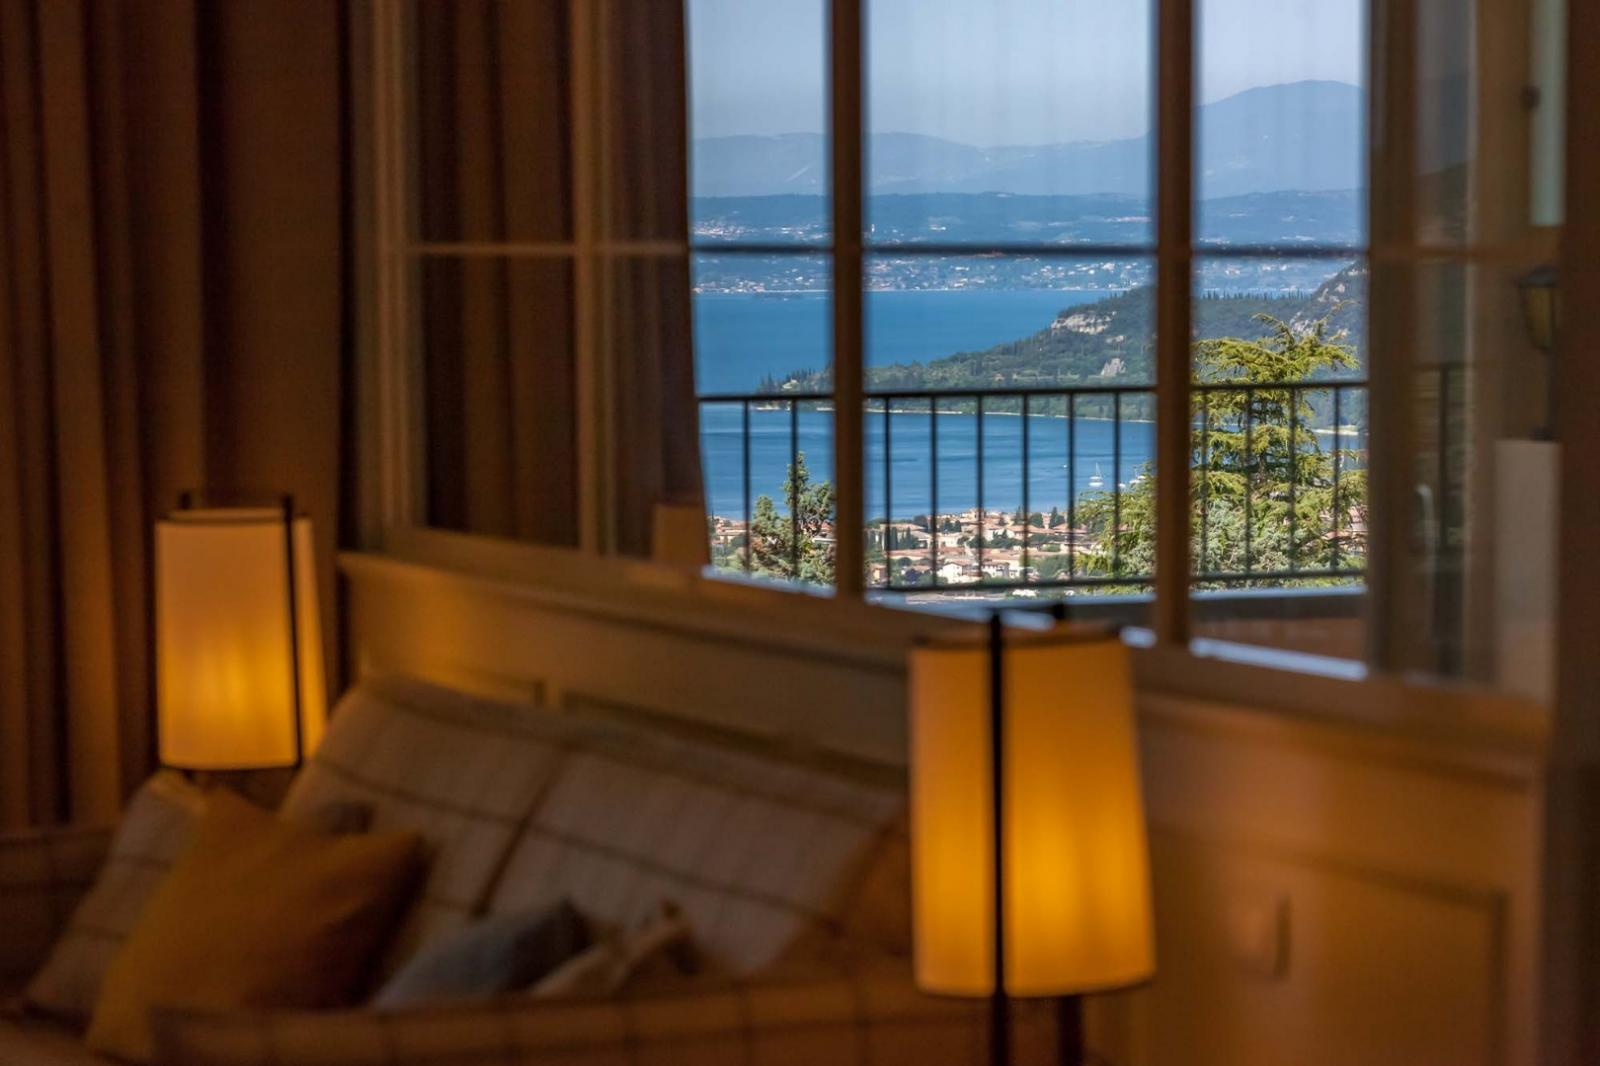 Qi Chi: Foto vom Wellnesshotel Boffenigo Panorama & Experience Hotel | Wellness Venetien